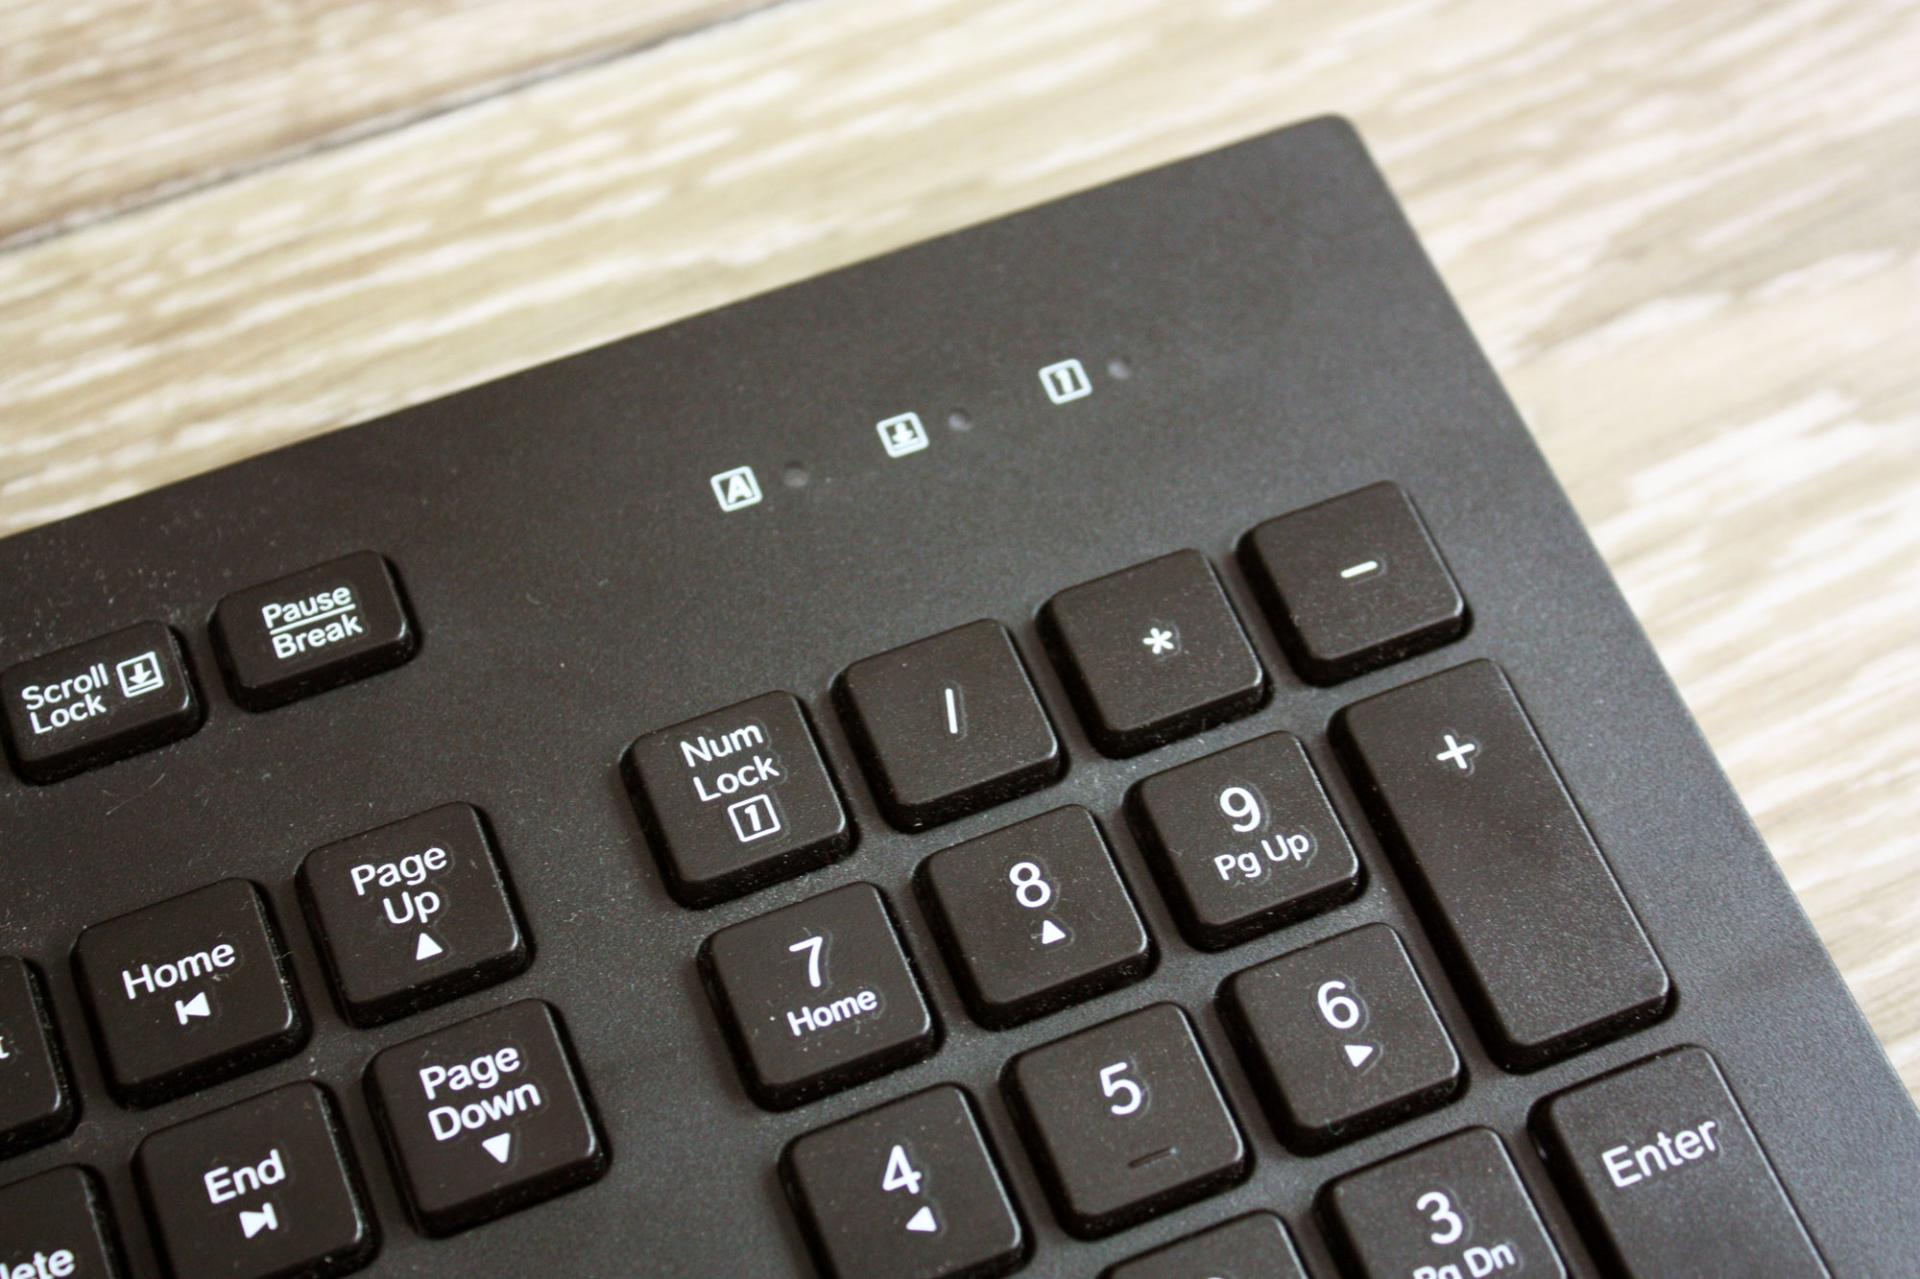 Обзор клавиатуры Logitech k280e